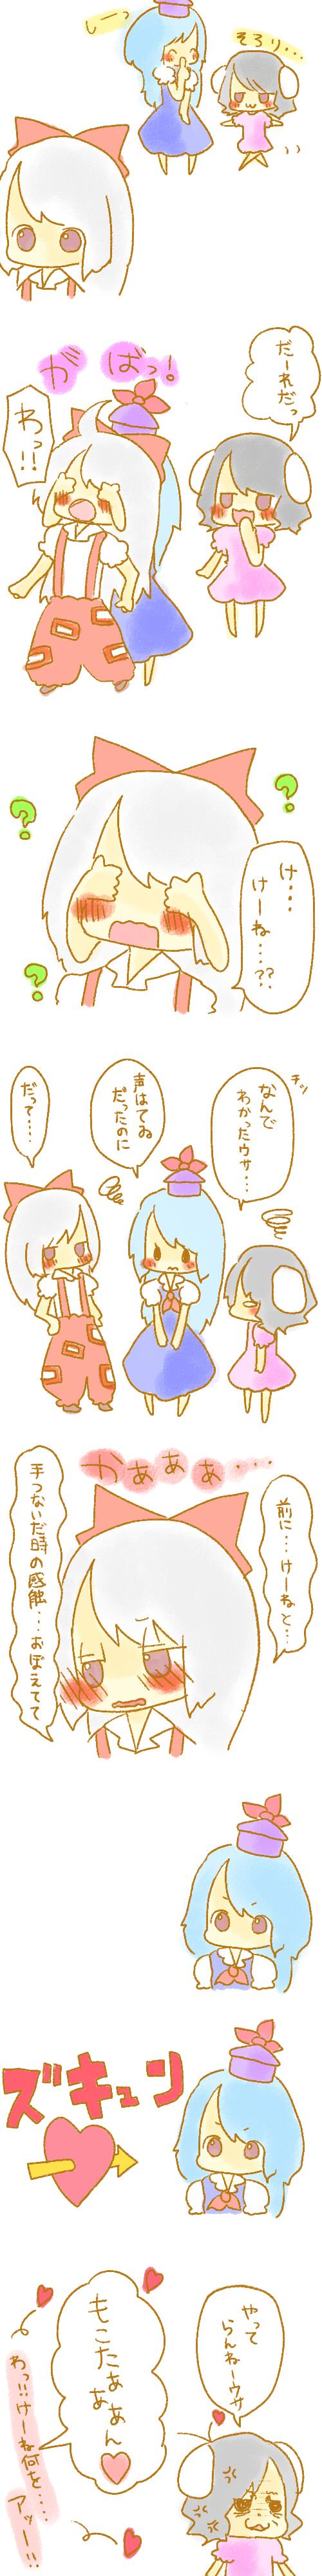 fujiwara no mokou, inaba tewi, and kamishirasawa keine (touhou) drawn by moko (iiioookkkaaa)